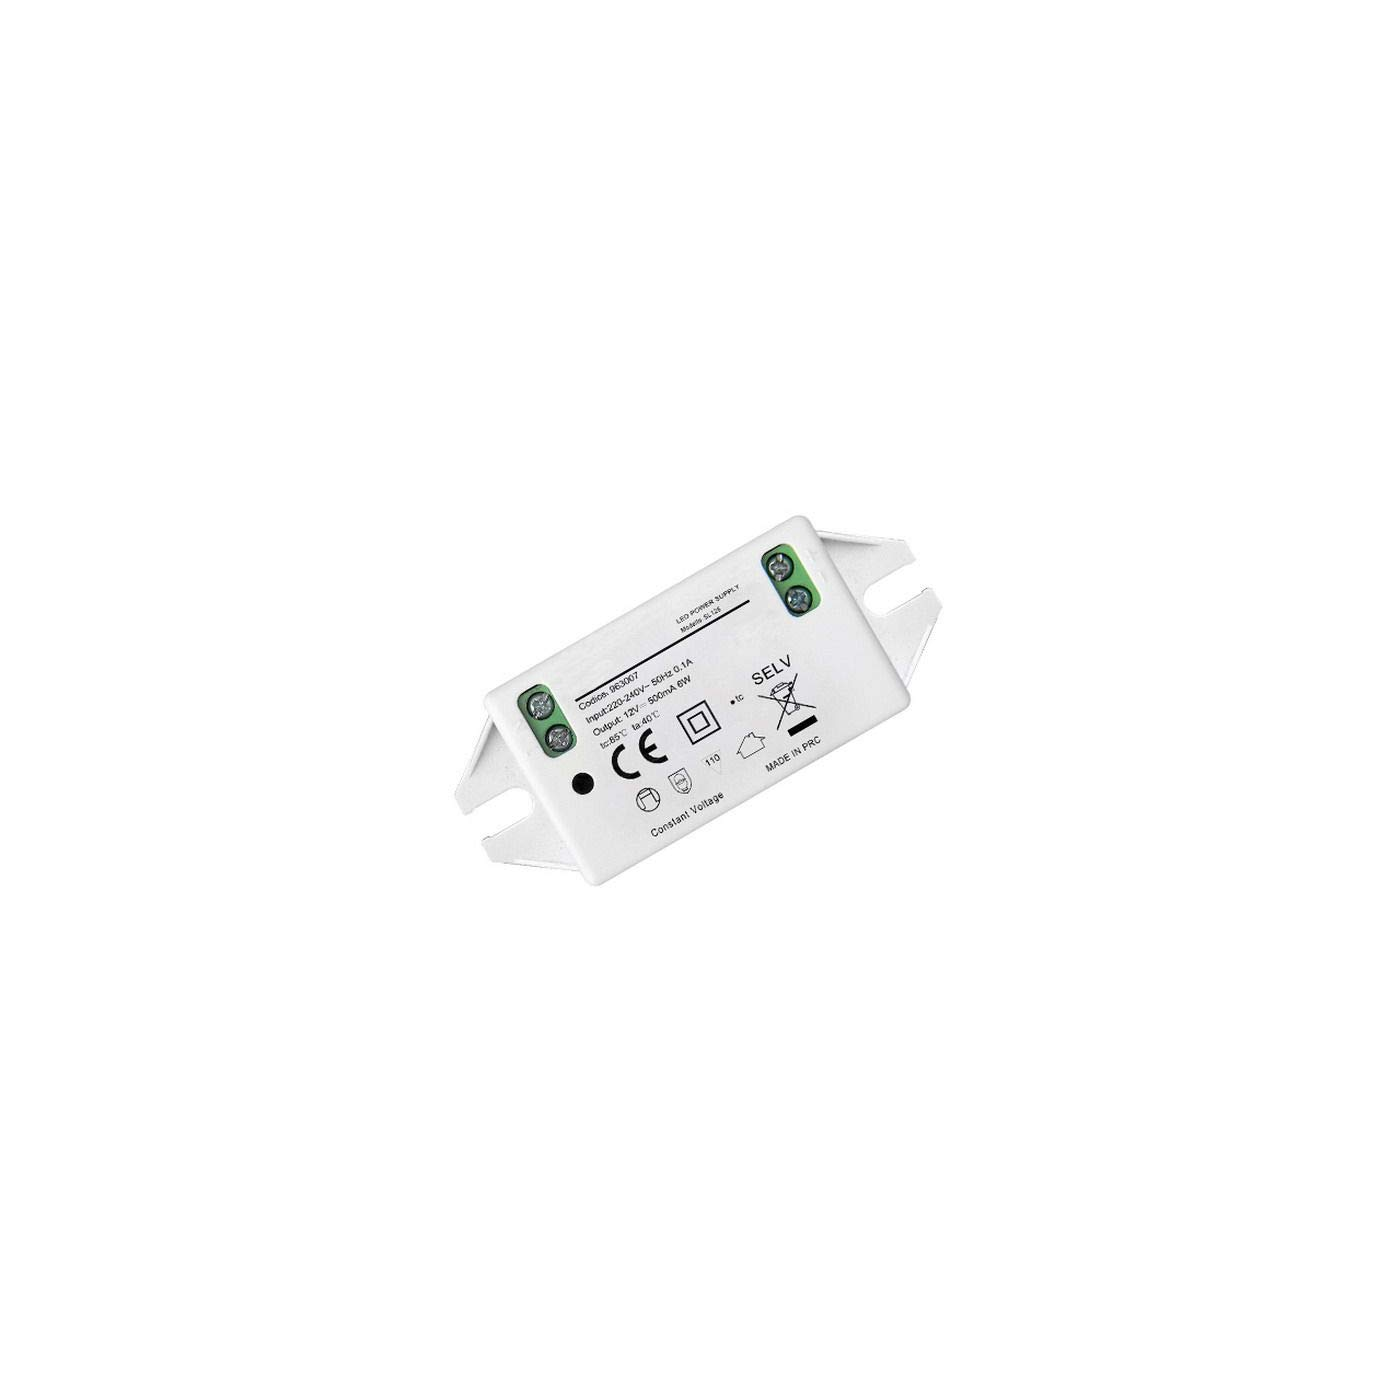 Micro Alimentatore Driver Per Led 12v Dc 6w 500ma Power Supply